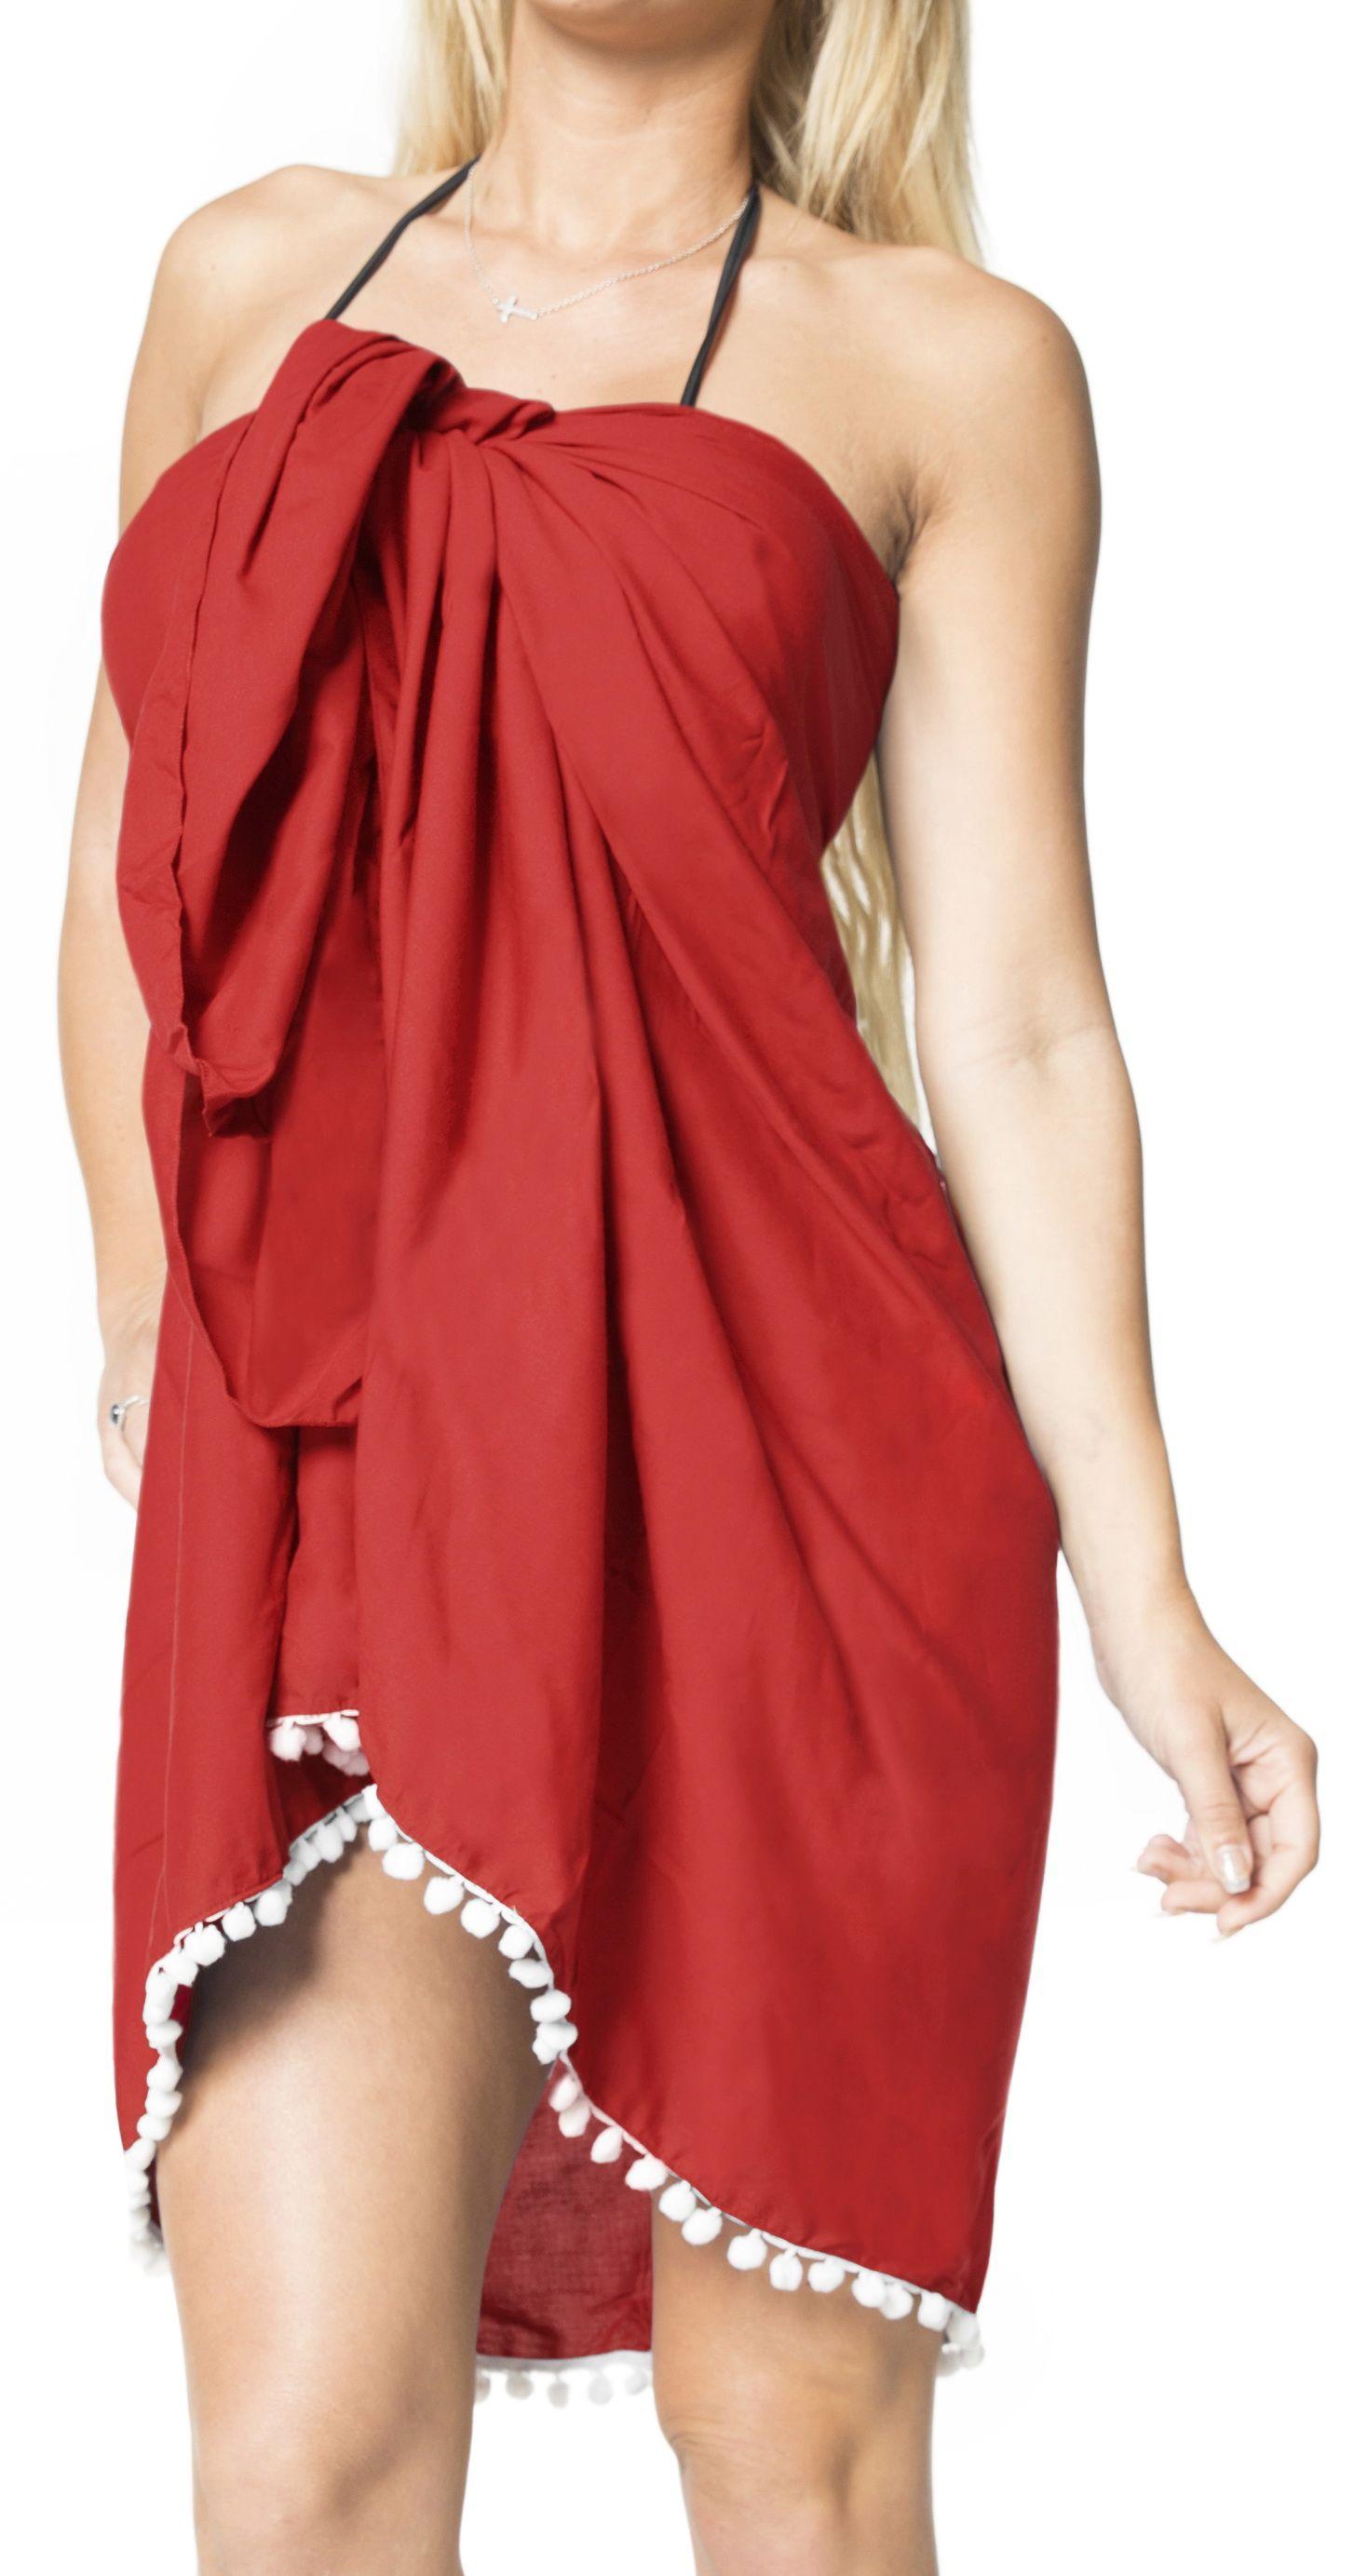 9ea03be551 Sarong Wrap Beachwear Bathing Suit Swimwear Swimsuit Cover ups Pareo Skirt  Women#Bathing, #Suit, #Swimwear